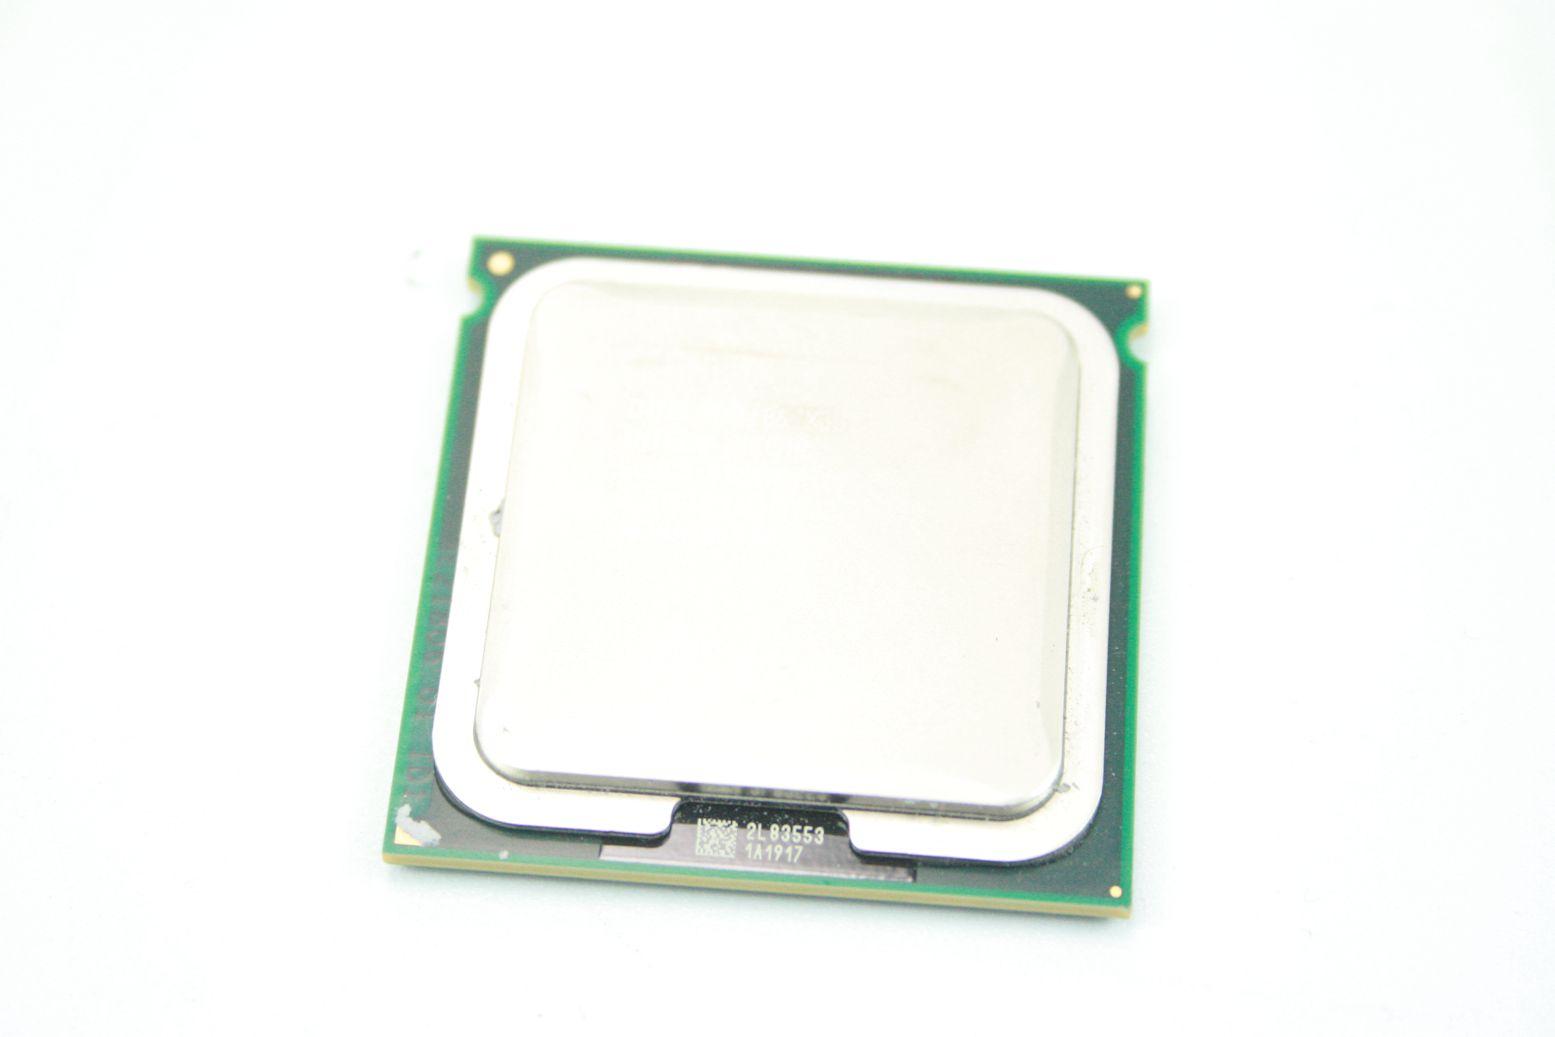 Intel Xeon E5-2407 2.2 GHz Sockel 1356 Quadcore 4-Core CPU SR0LR